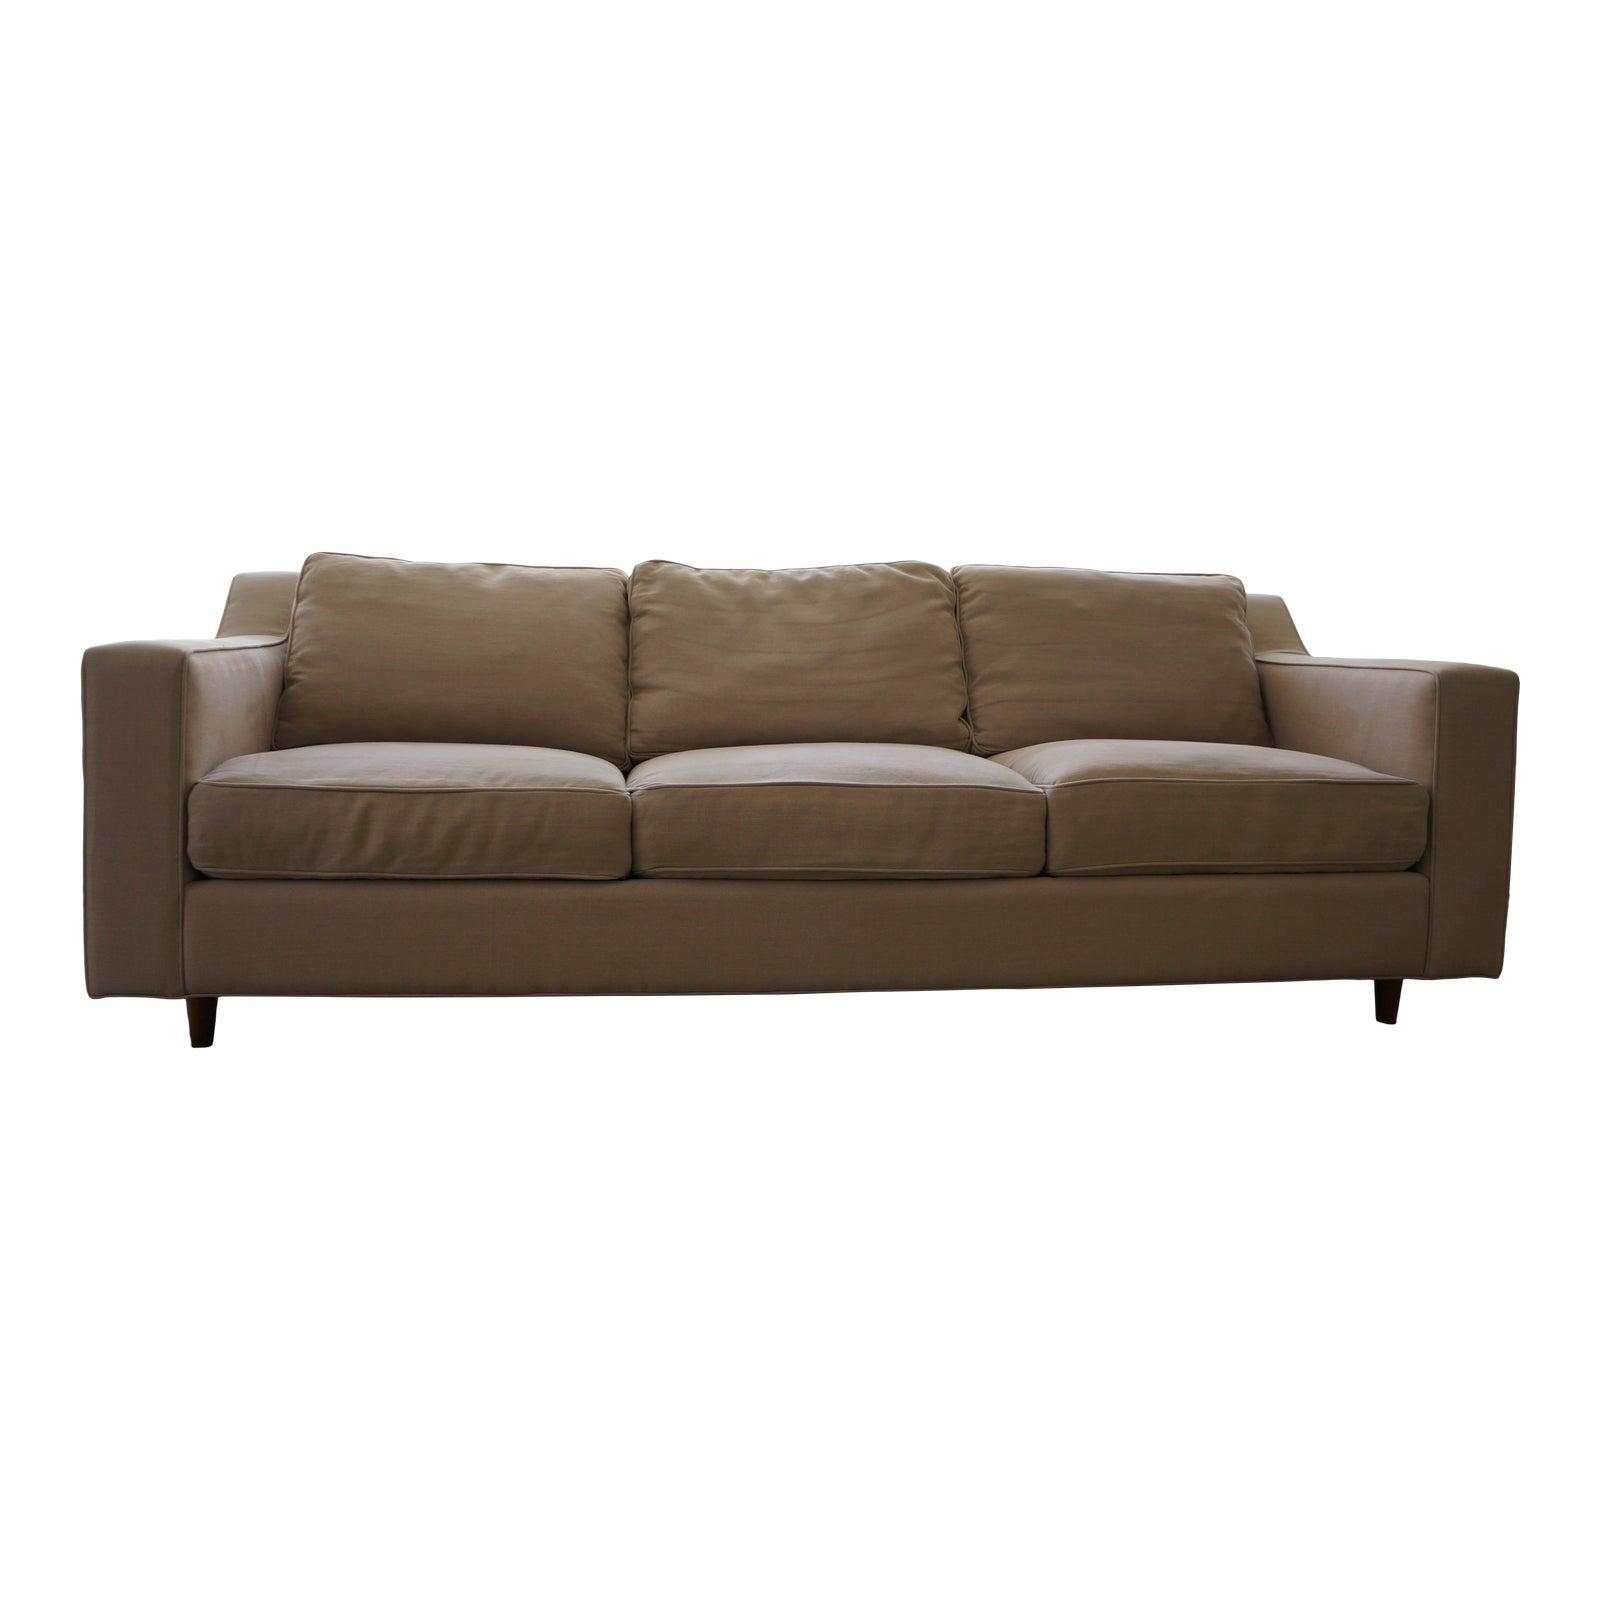 Modern dwell natural linen studio sofa chairish